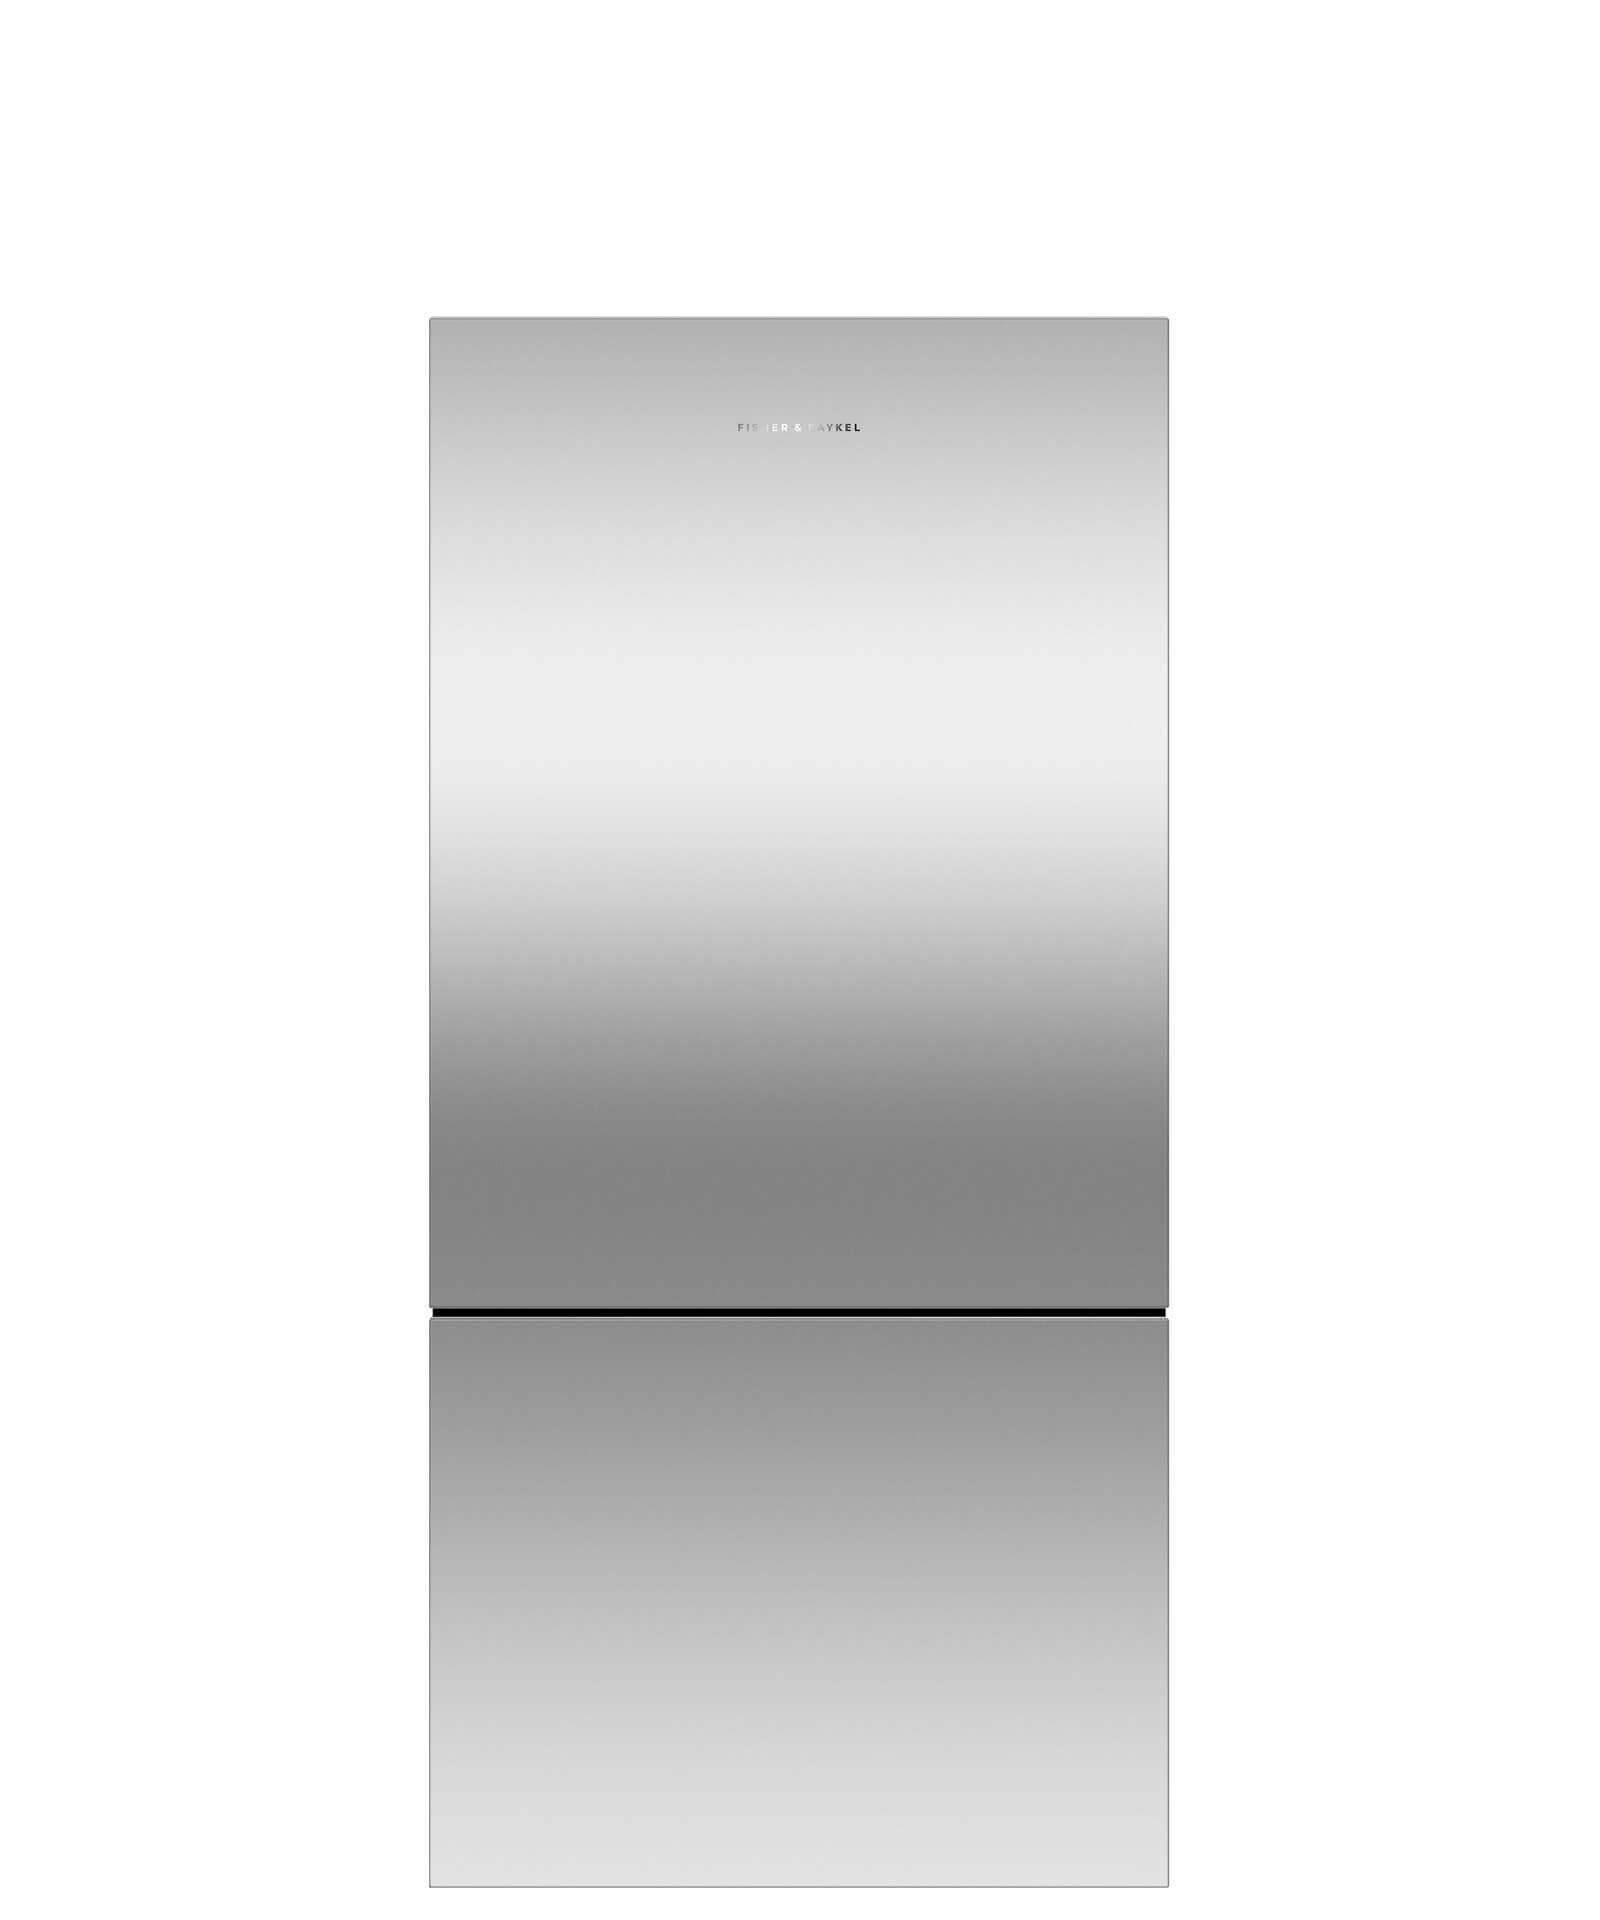 SCRATCH AND DENT--Counter Depth Refrigerator 17.5 cu ft